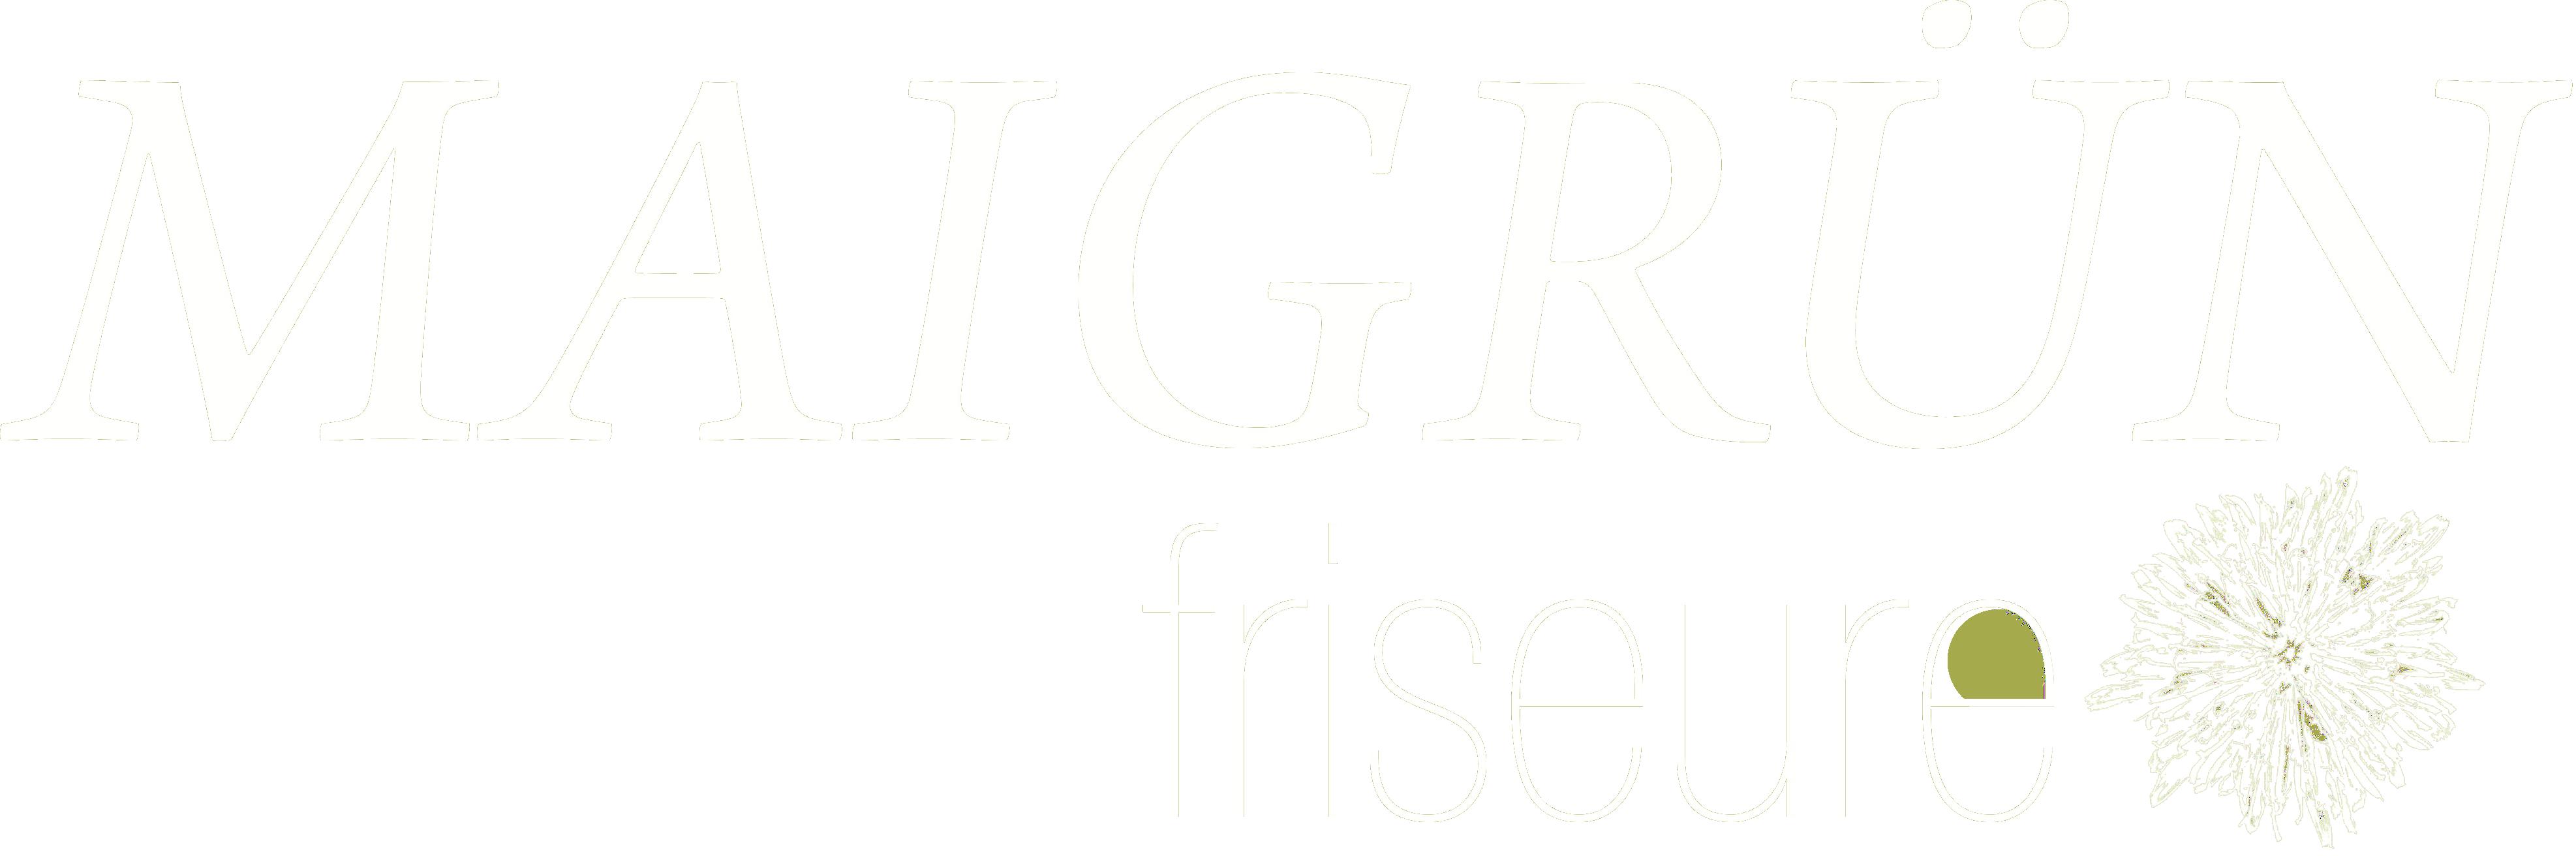 Maigruen Friseure Sabine Rauen - Ihr Friseur in Berlin Lichterfelde